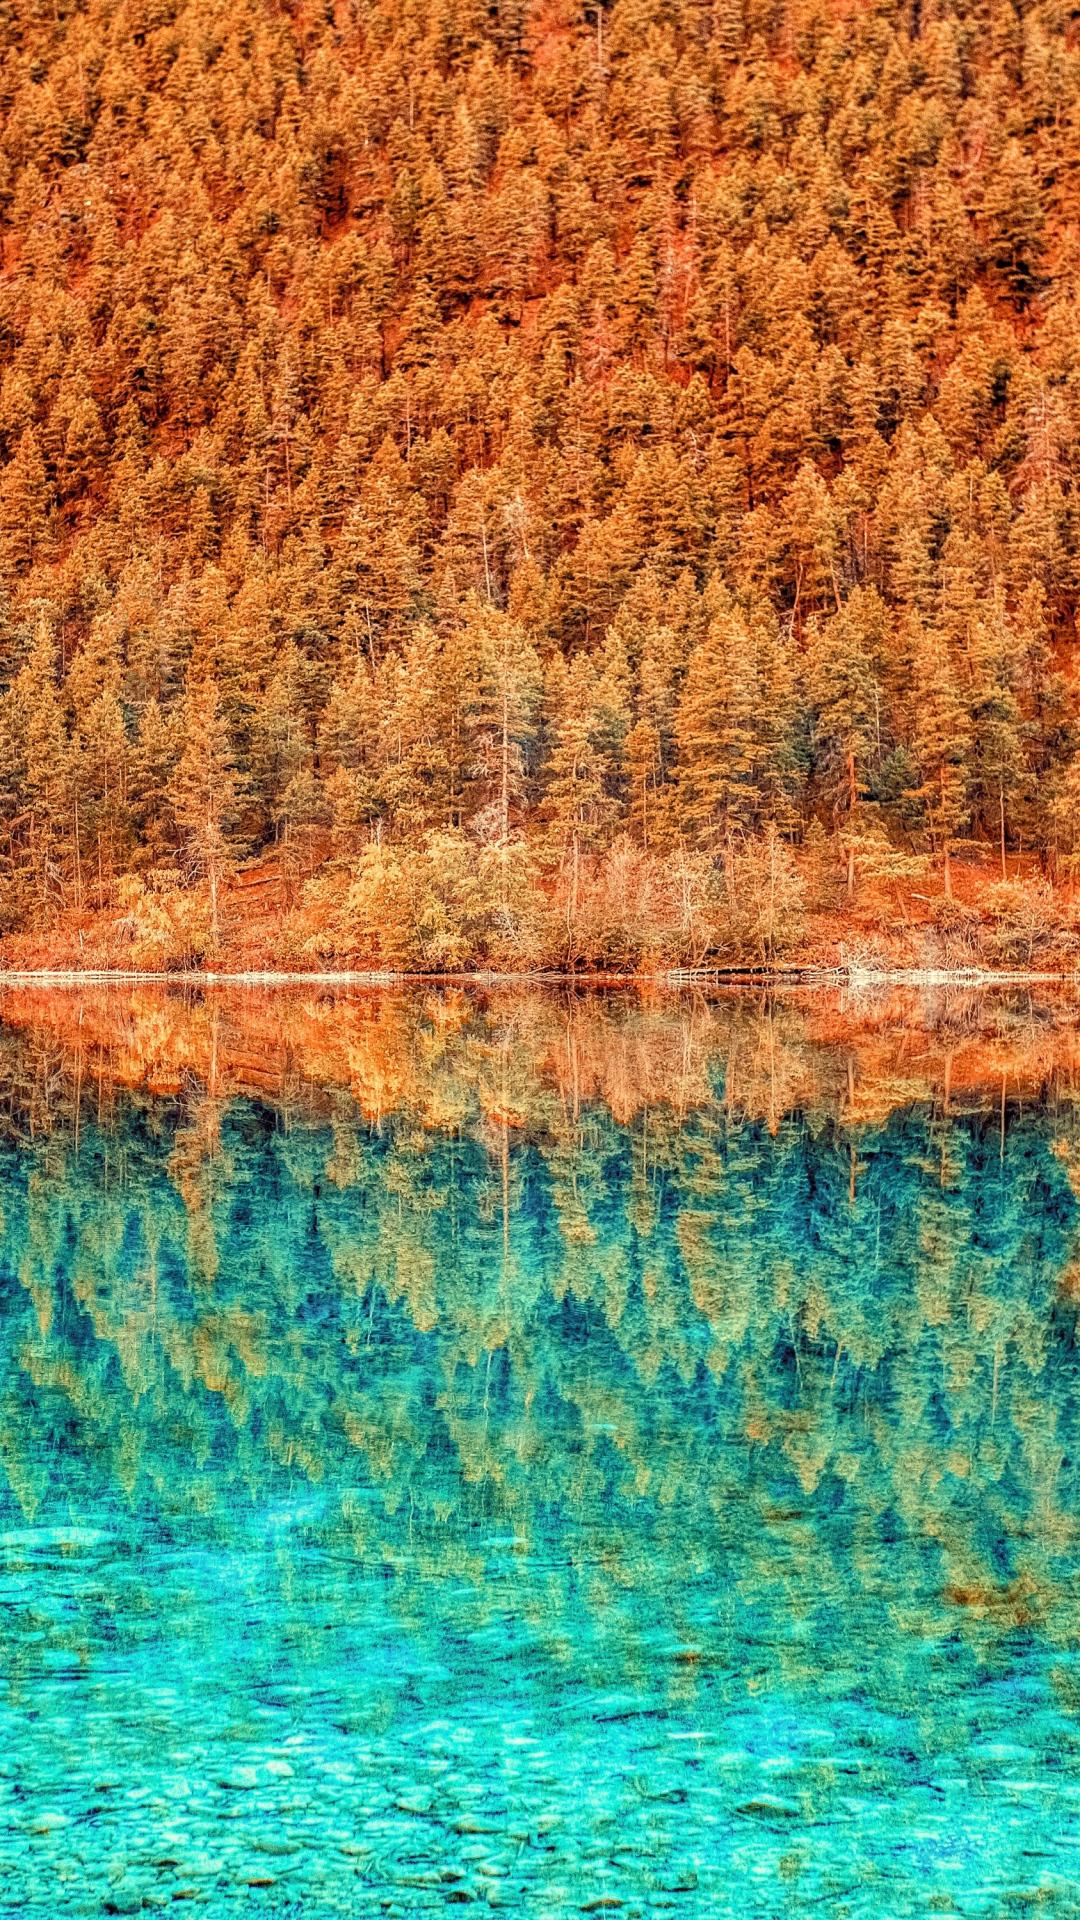 iPhone wallpaper 3wallpapers lake trees reflection Lake